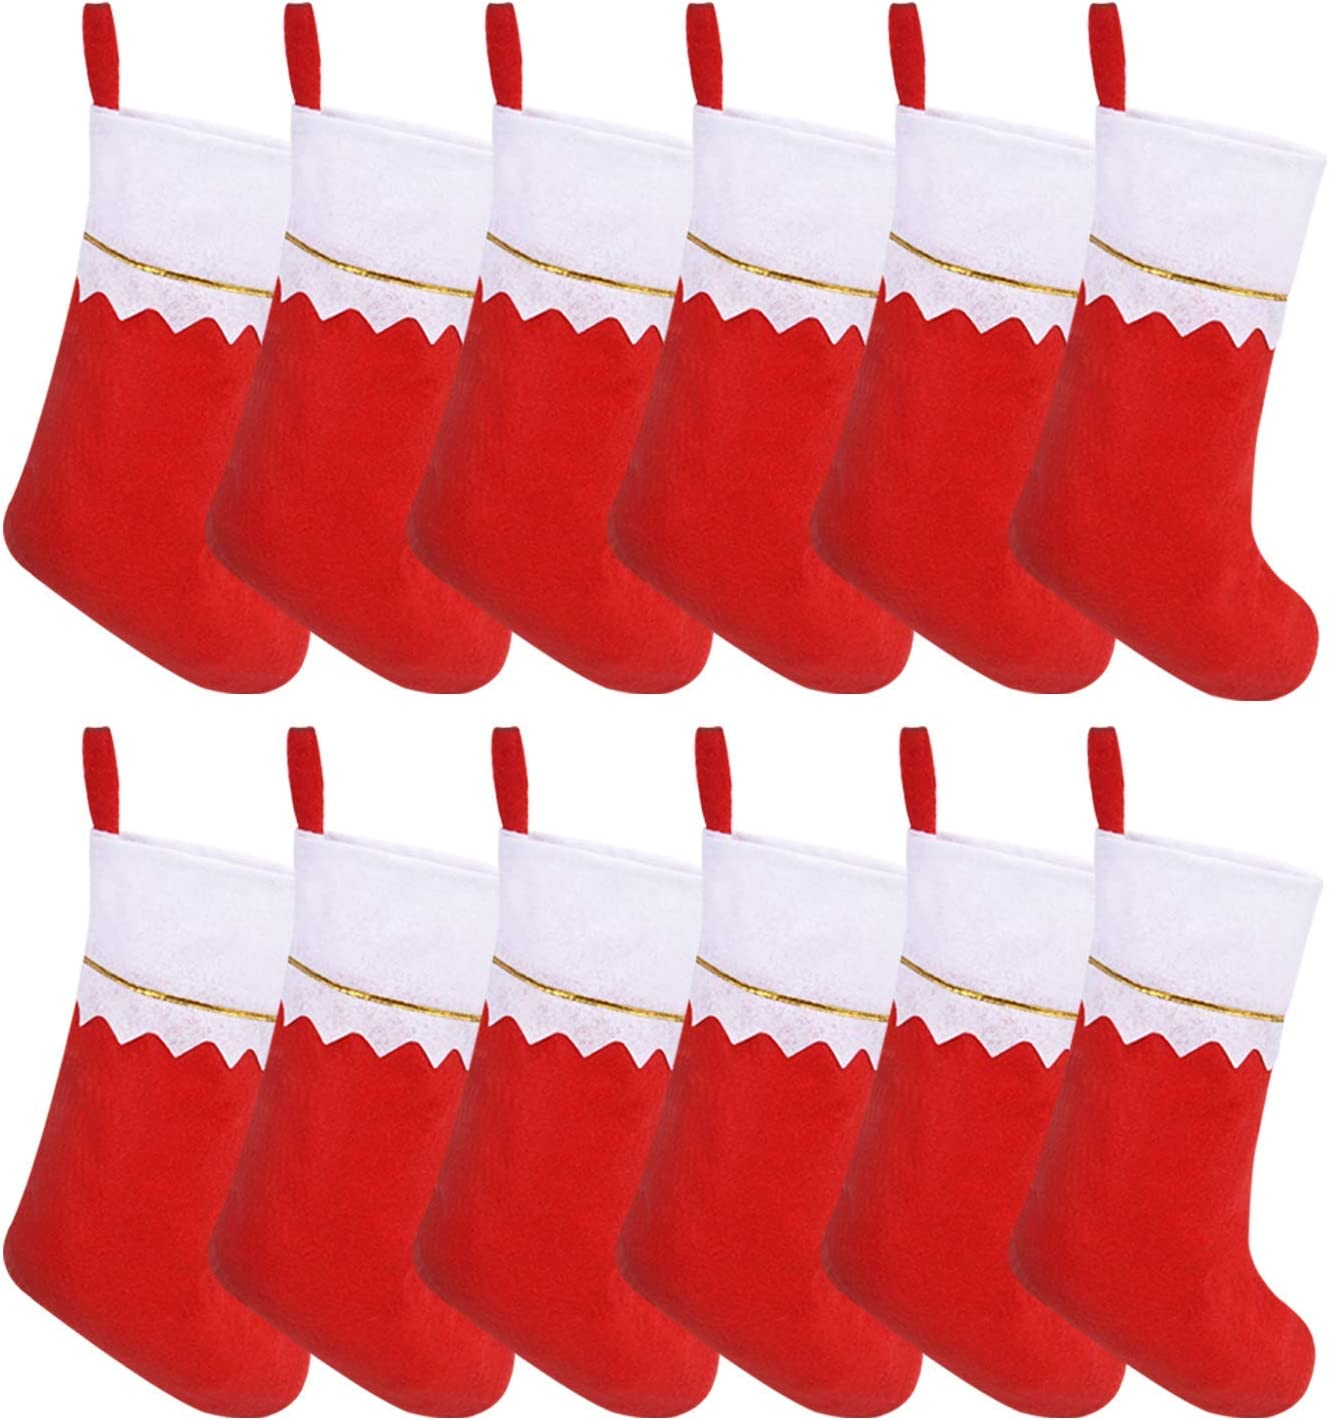 WJA Under blast Max 53% OFF sales 12 Pack Red Felt Holiday Stockings Christmas Bulk